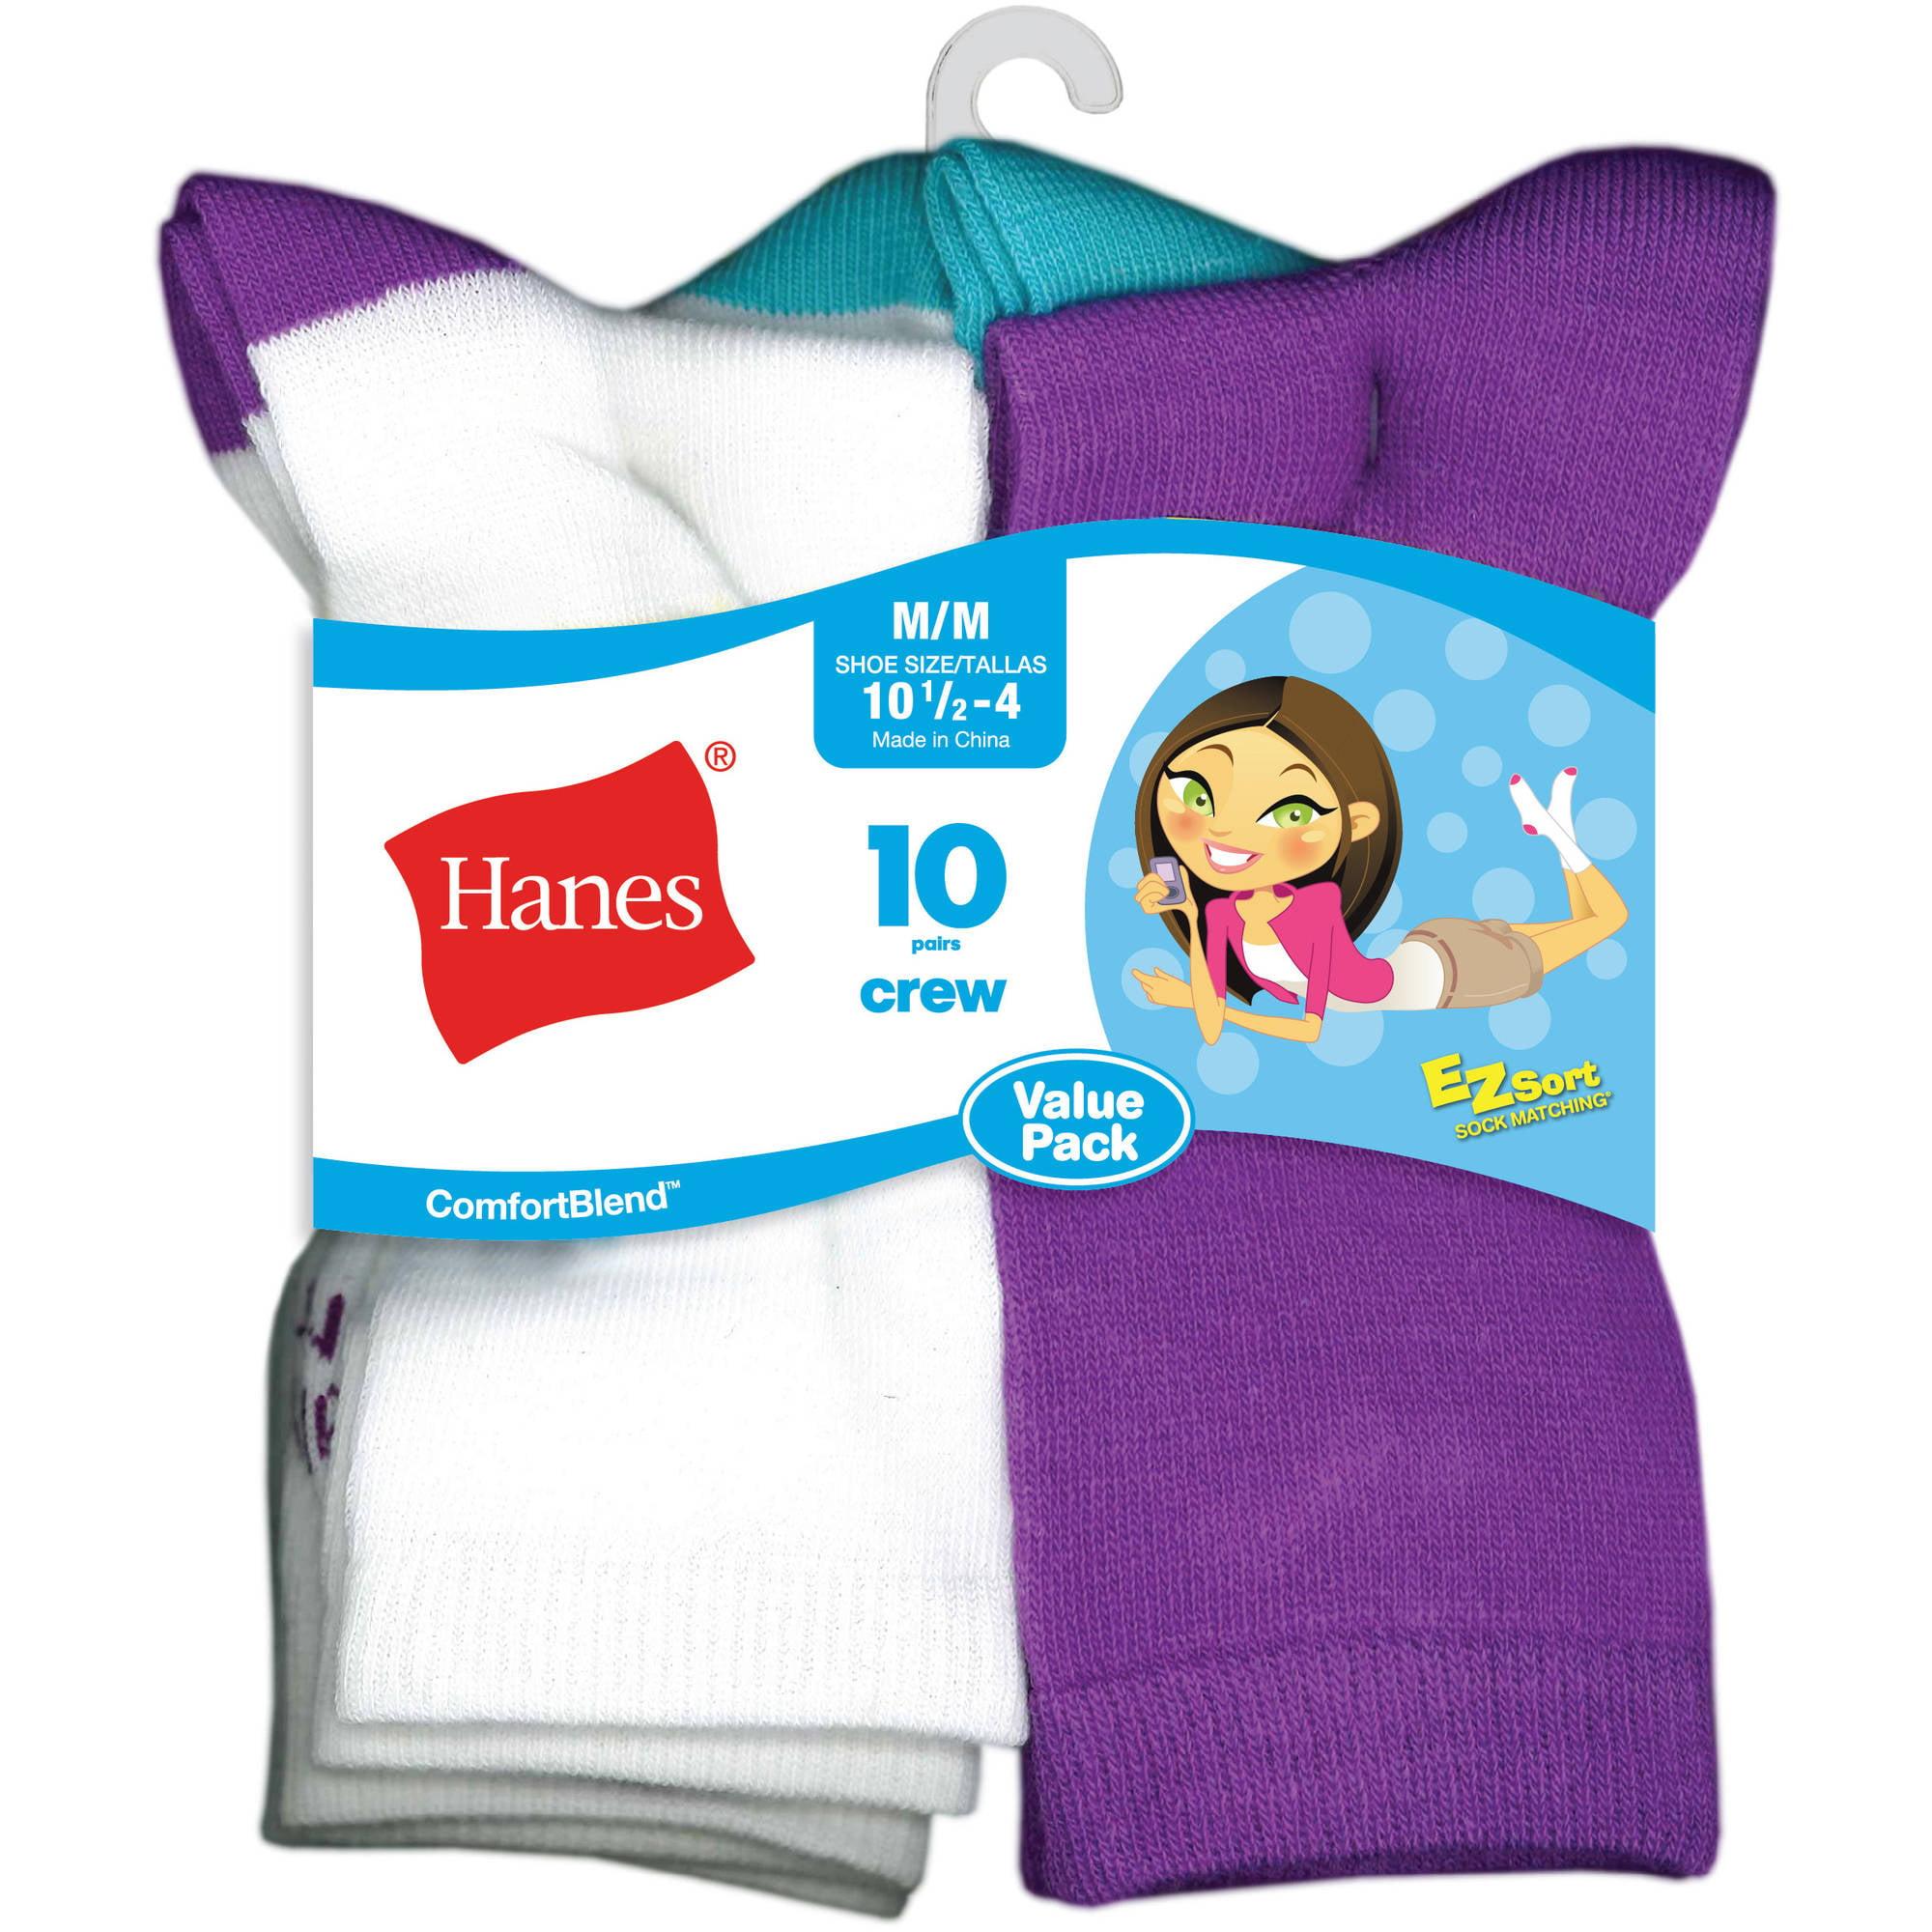 Hanes Girls No-Show EZ Sort/® Socks Assorted 10-Pack